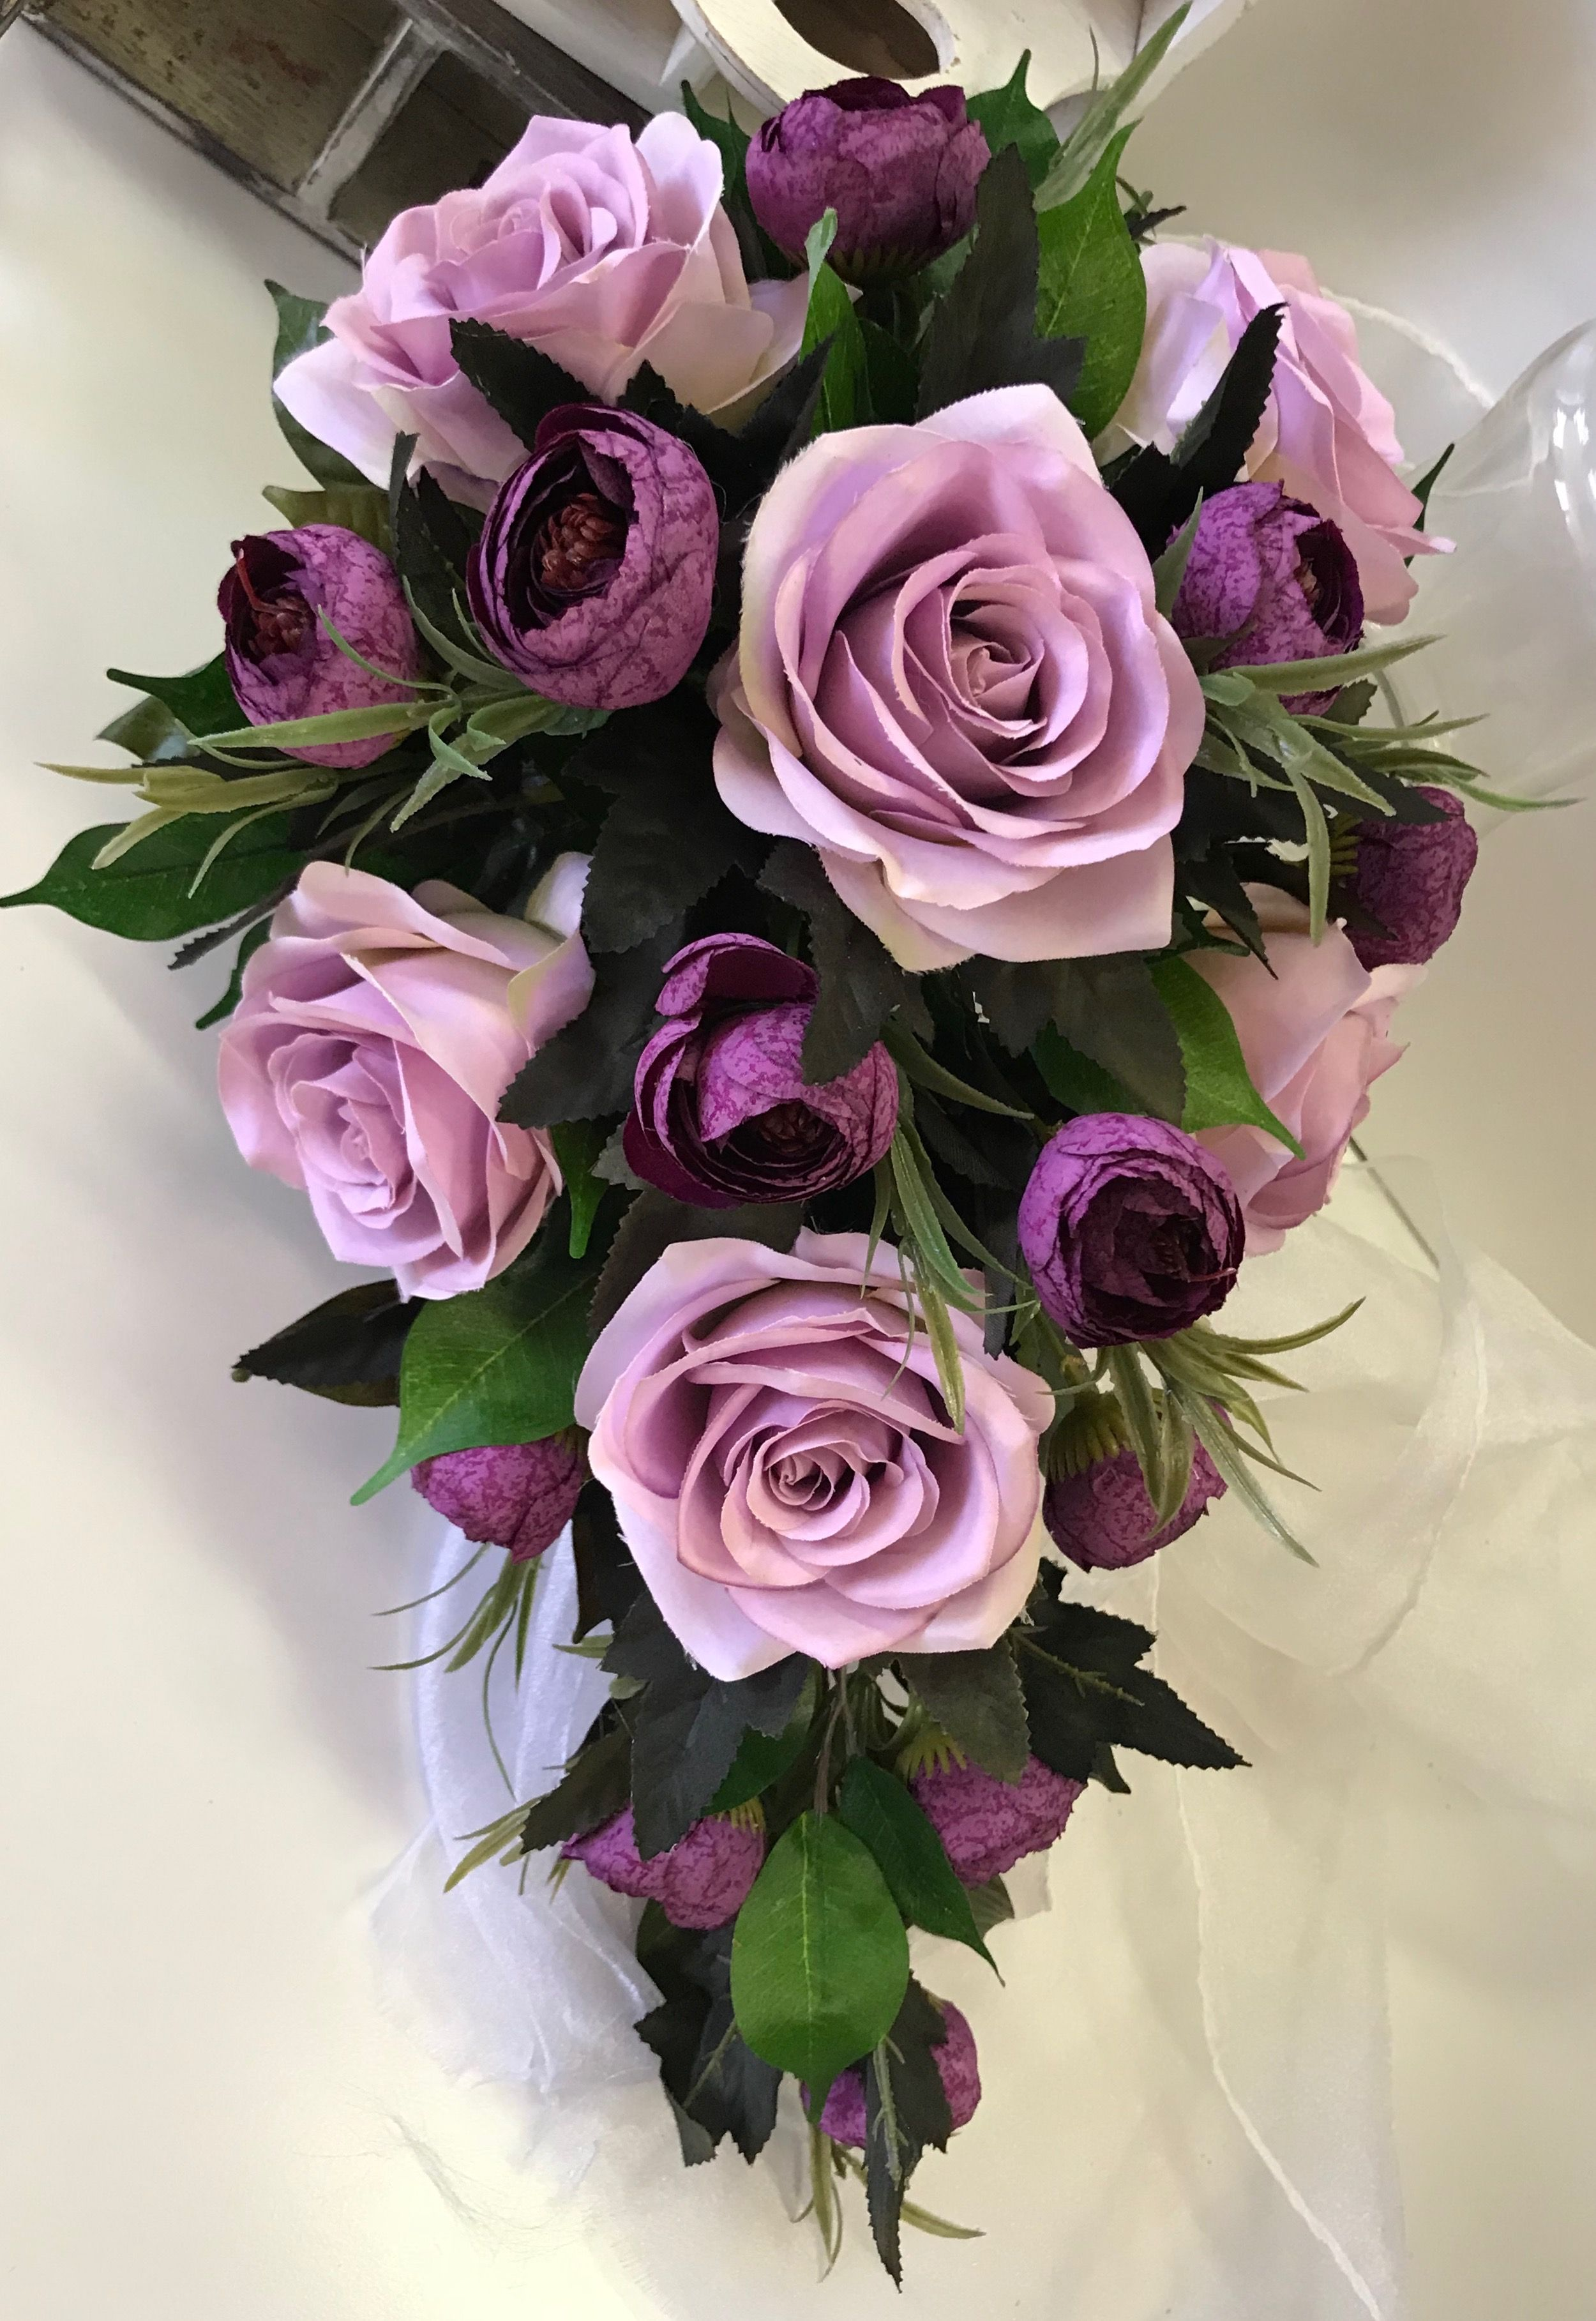 Pin by Vladislav on Weddings | Pinterest | Purple wedding, Purple ...